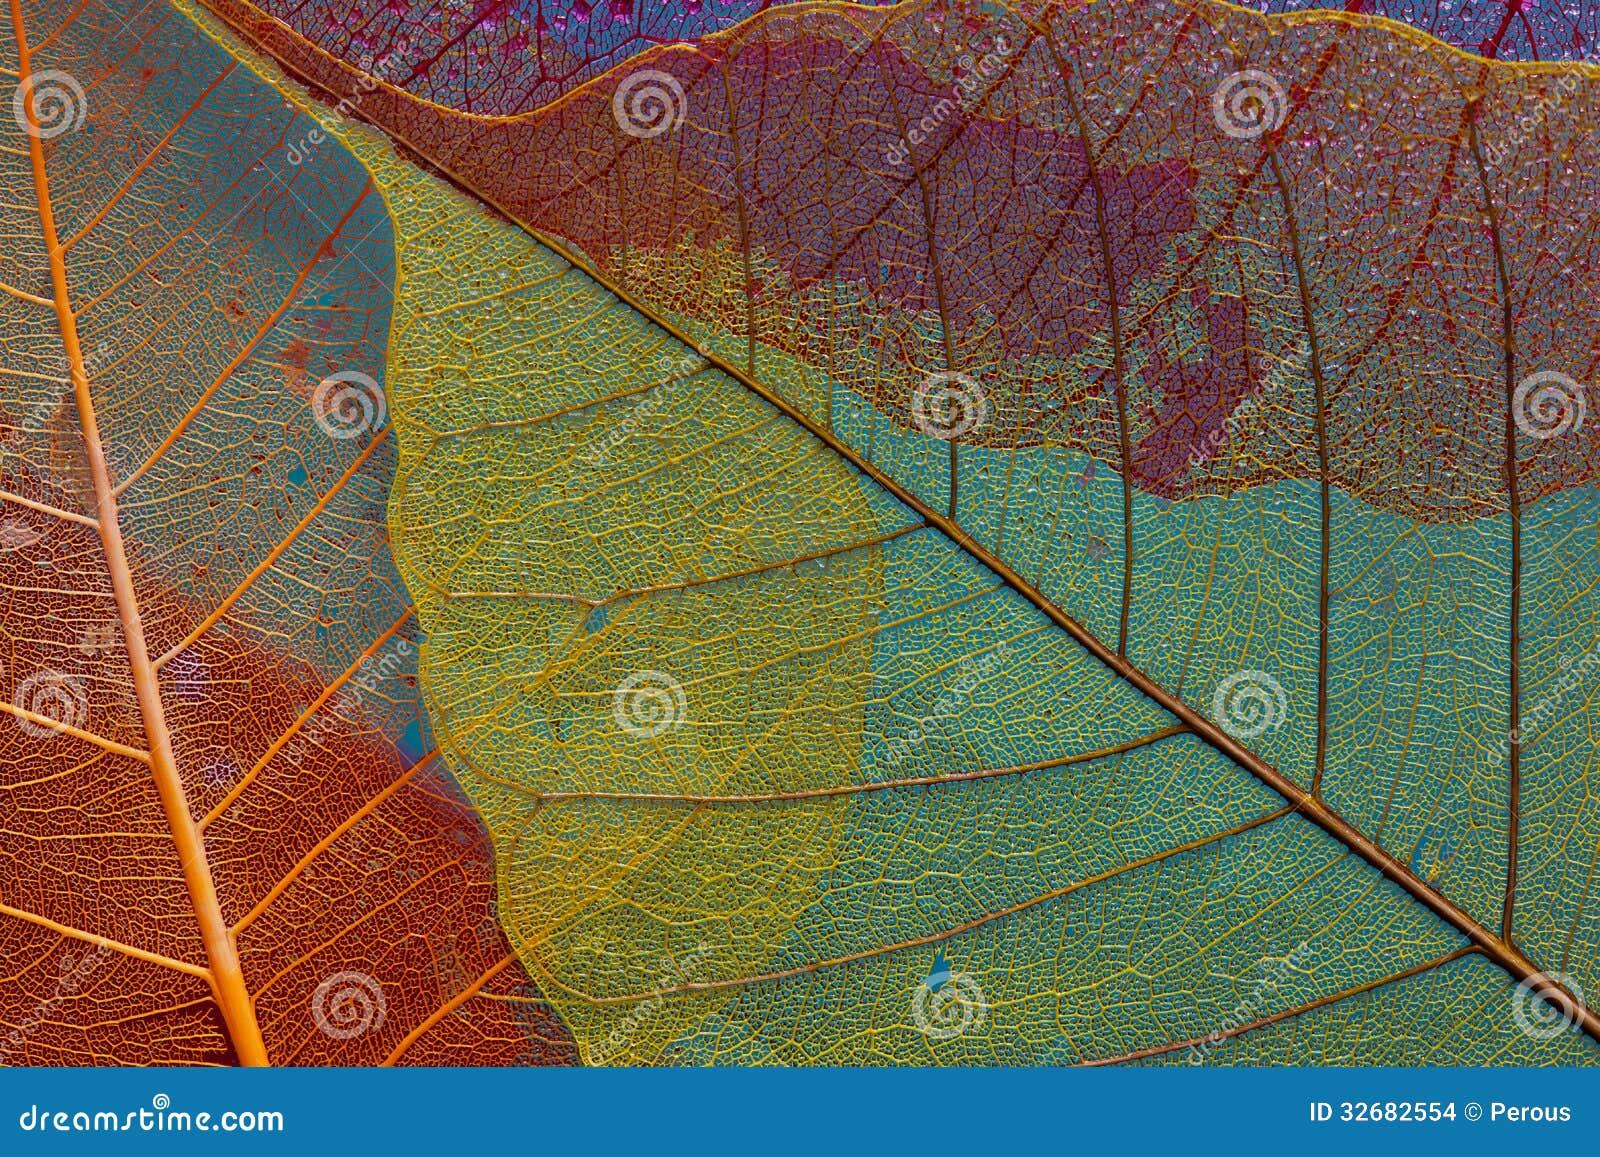 Silhouette leaf three